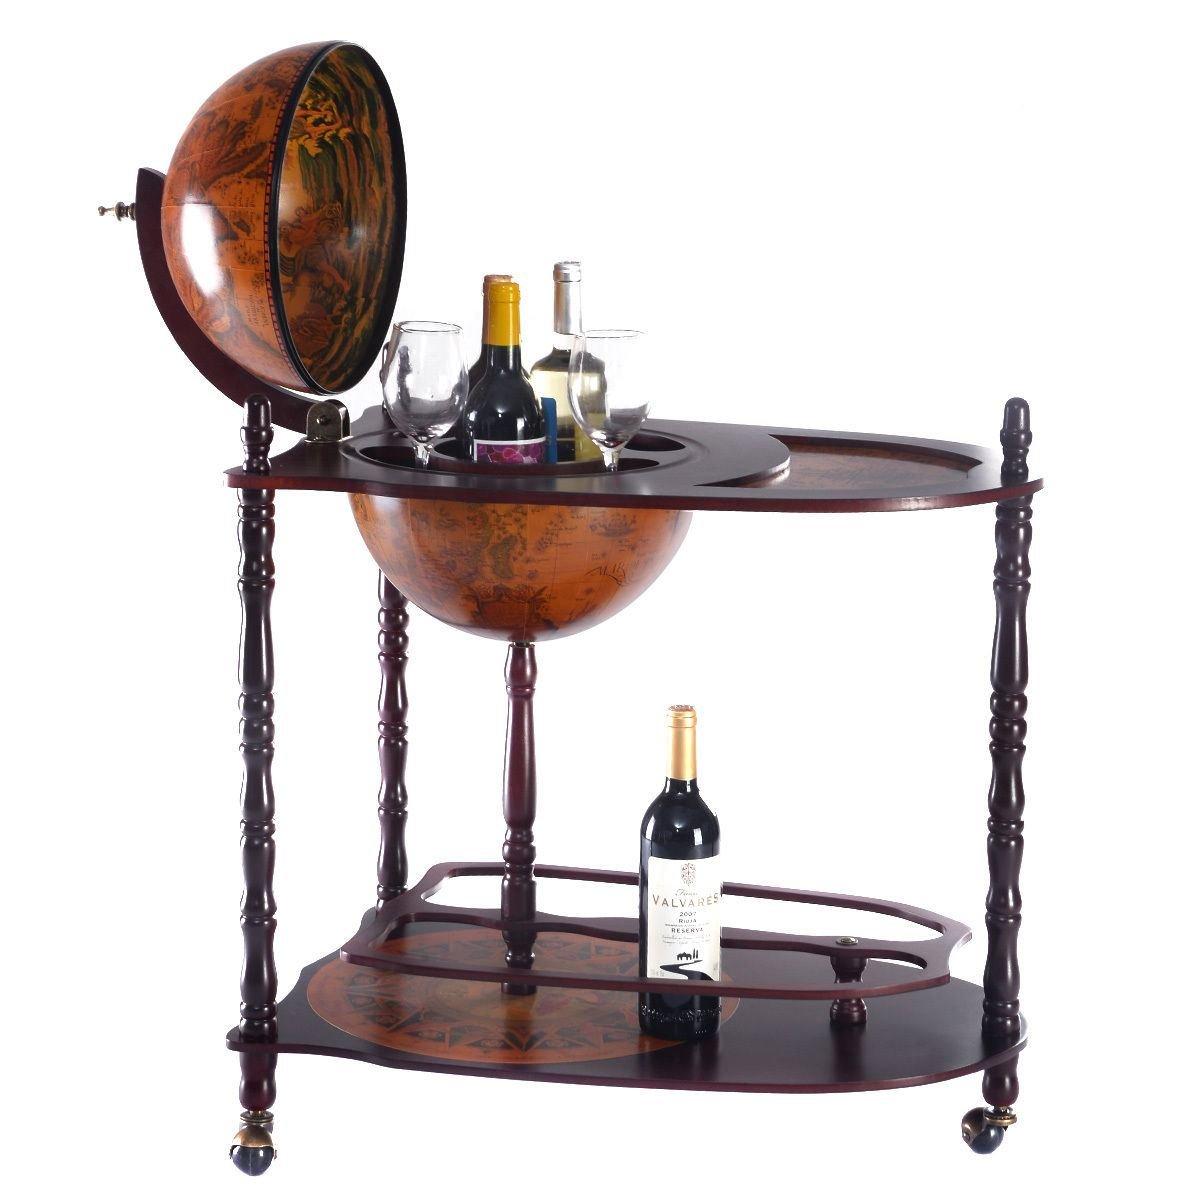 MasterPanel - Wood Globe Wine Bar Stand 34'' H 16th Century Italian Rack Liquor Bottle Shelf #TP3268